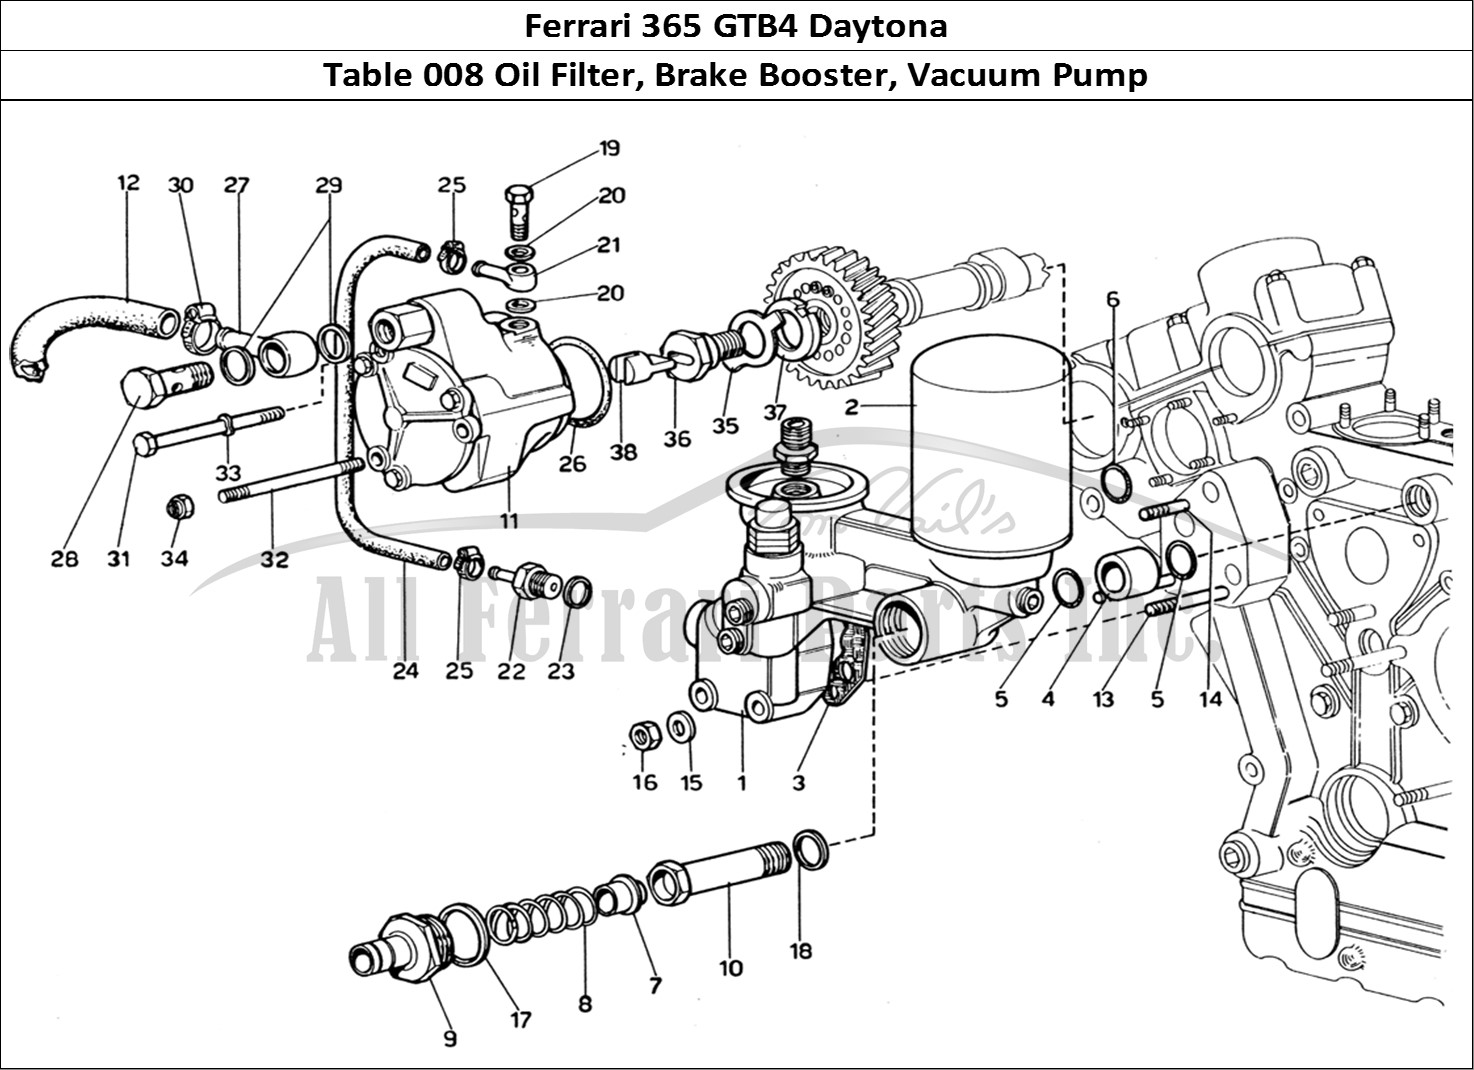 Buy Original Ferrari 365 Gtb4 Daytona 008 Oil Filter